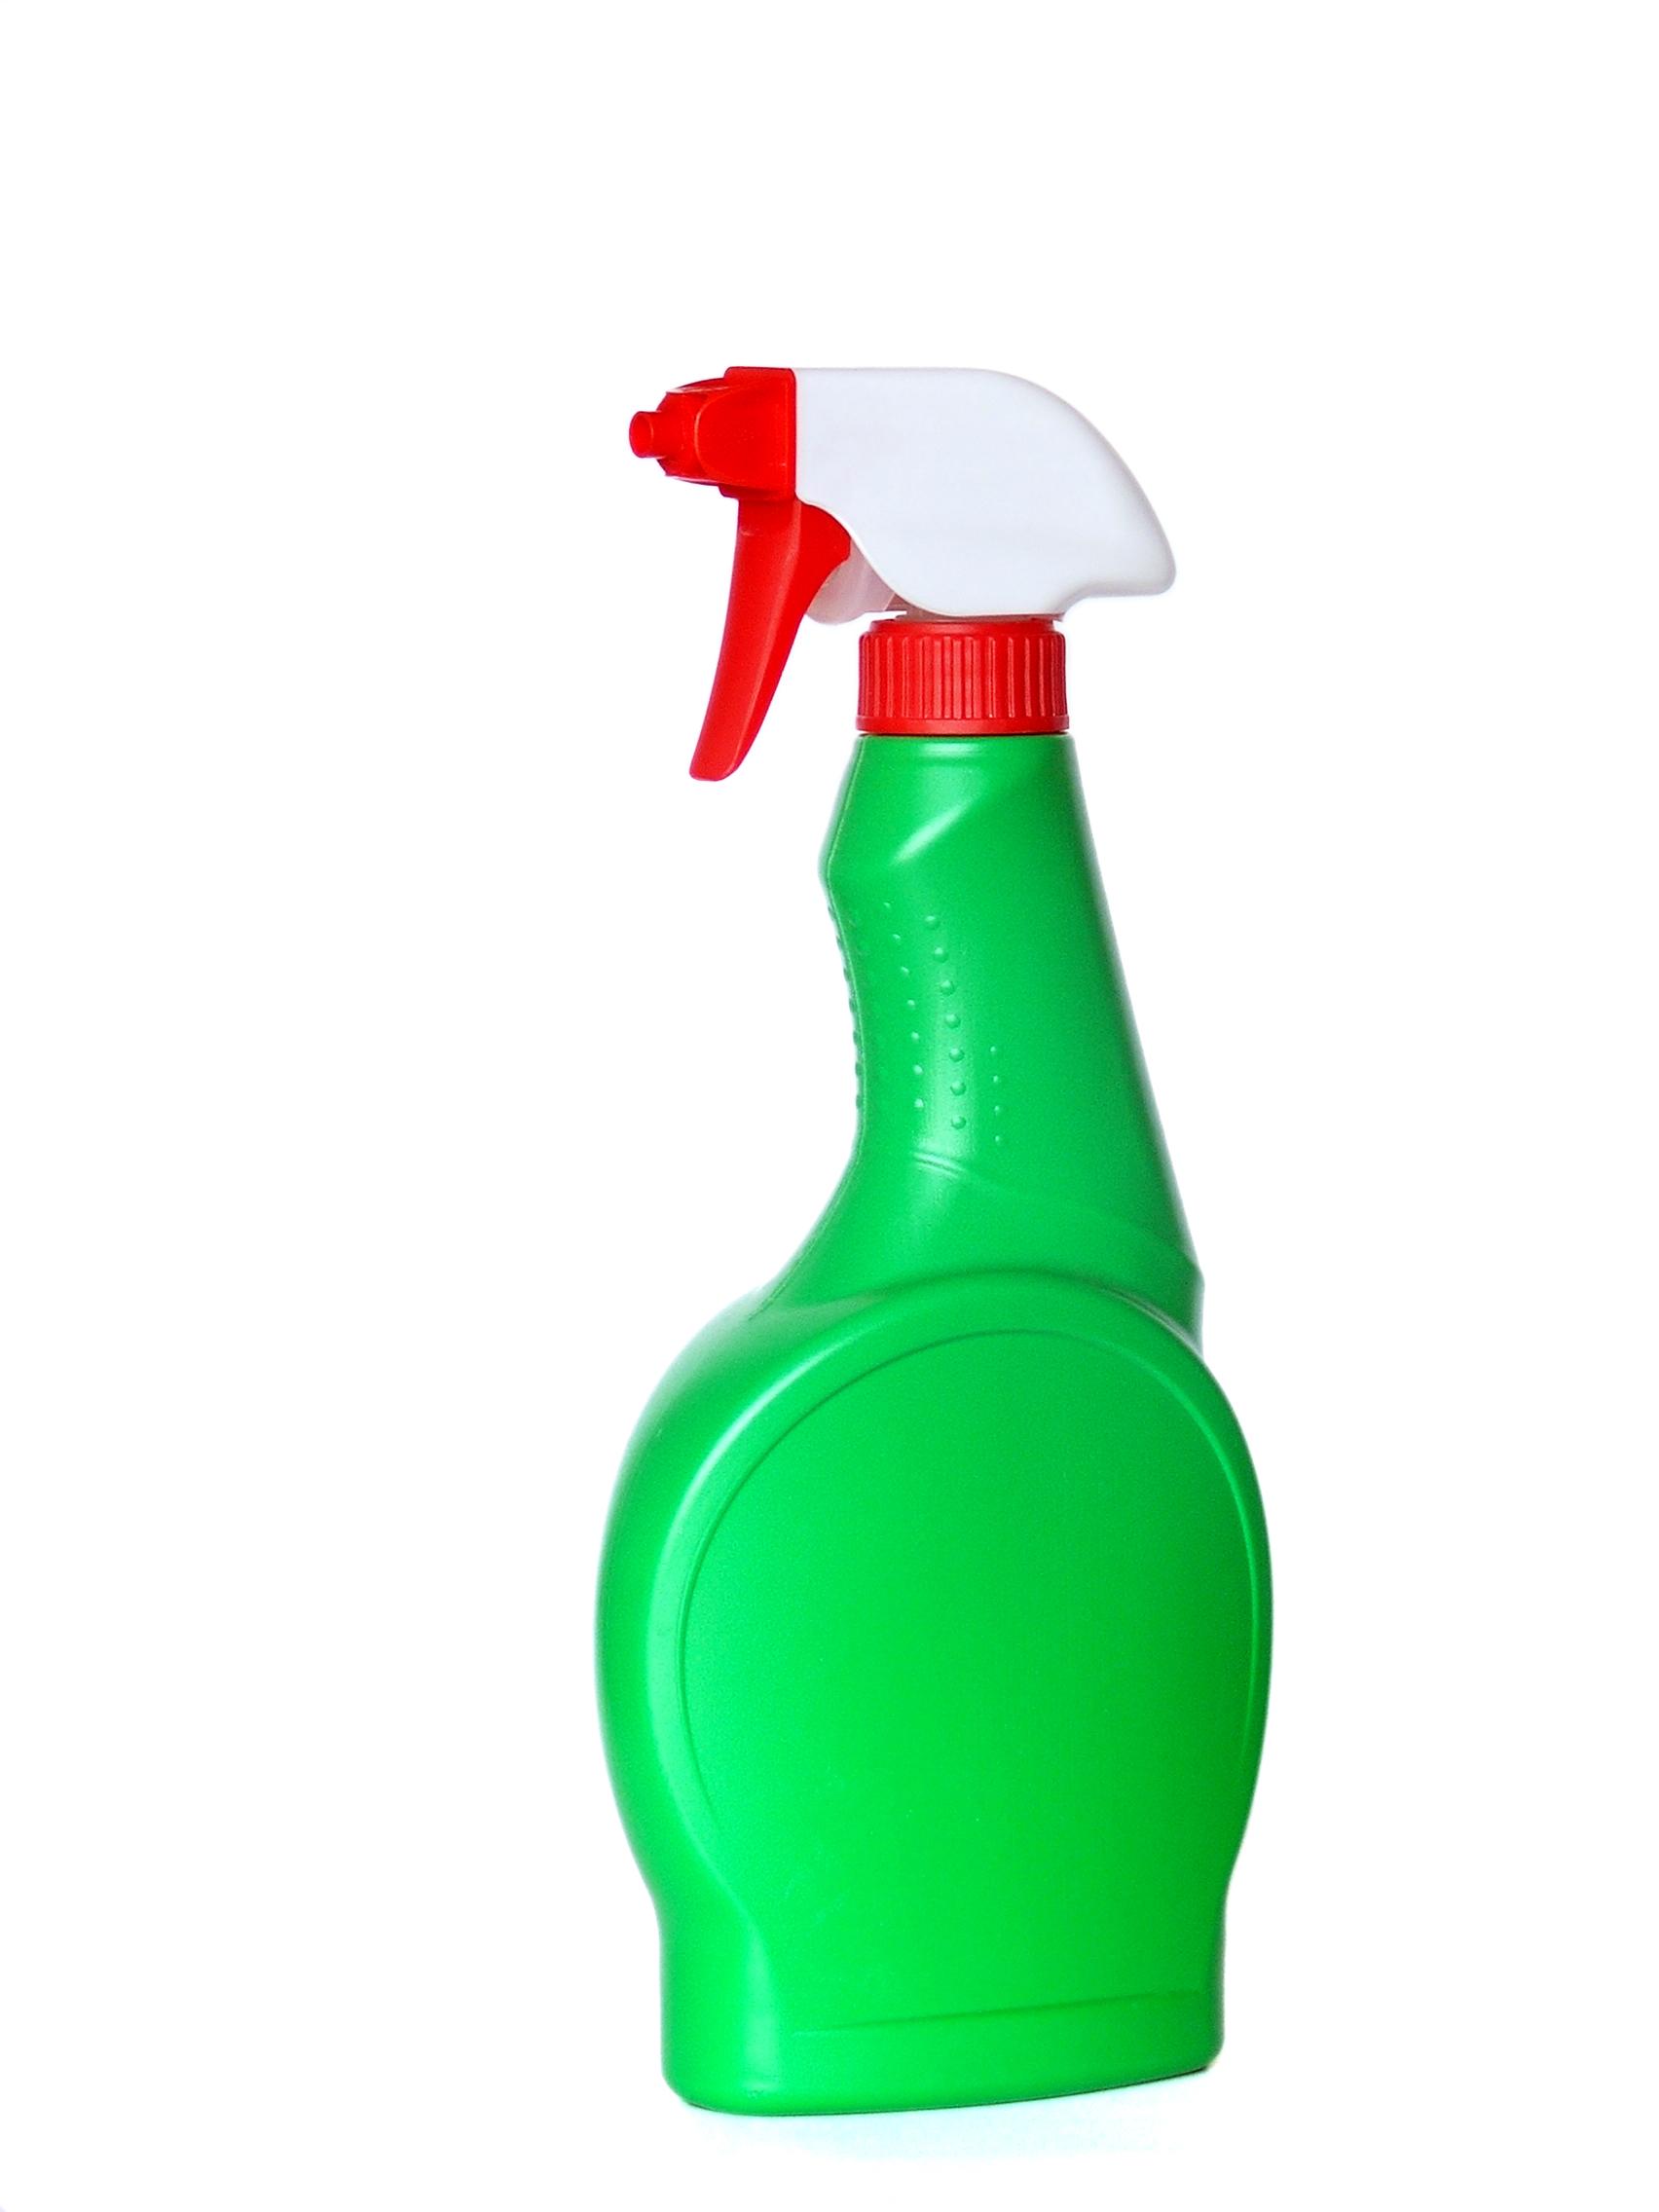 how to use roundup regular spray bottle